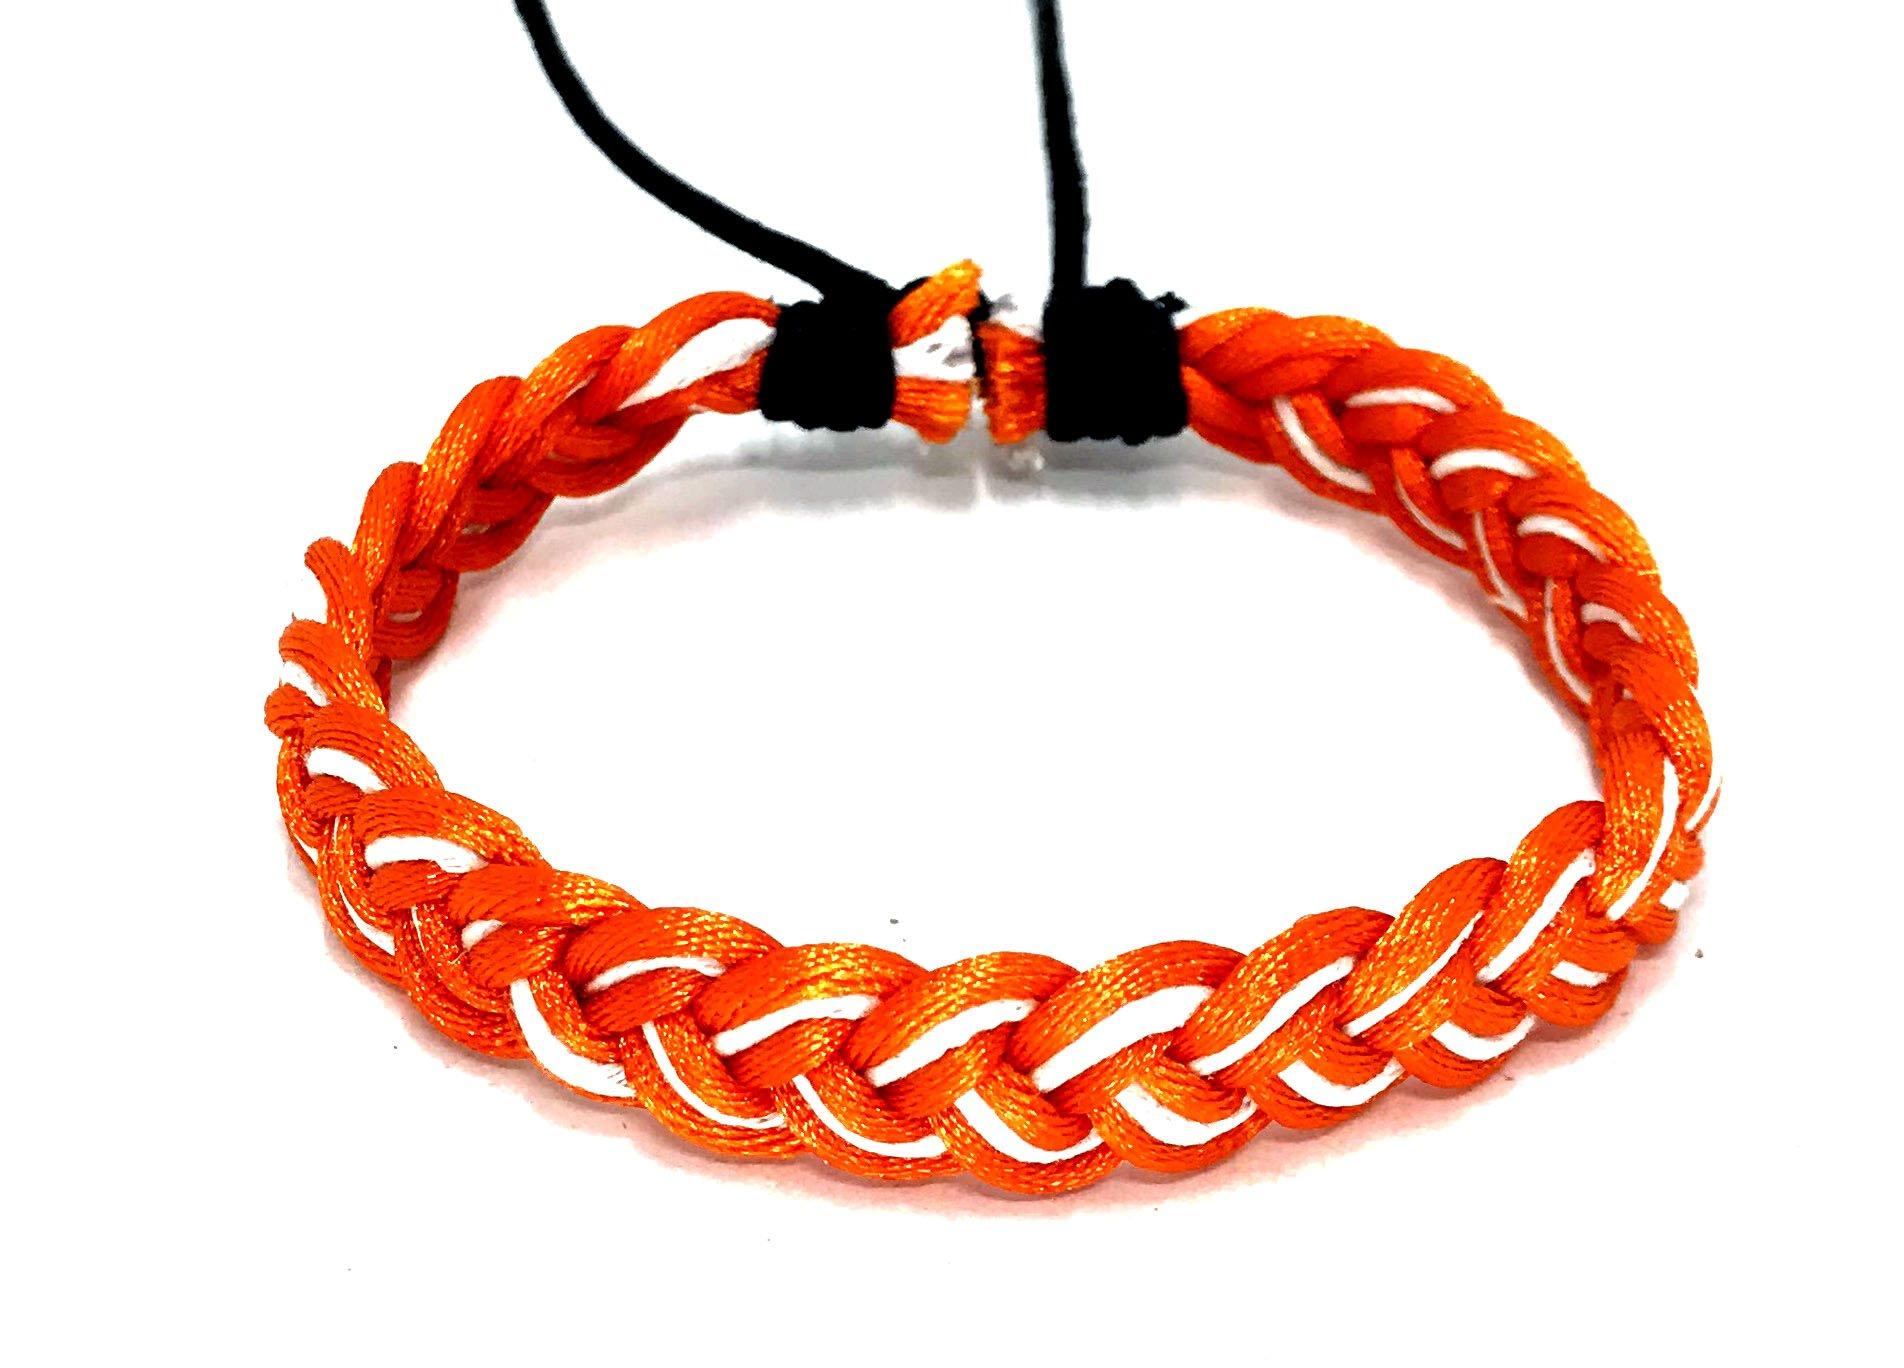 LAVIP Leather Handmade Men's Women's Cotton Funtasy Style Jamaican Bob Marley Wristband Bracelet (Orange)